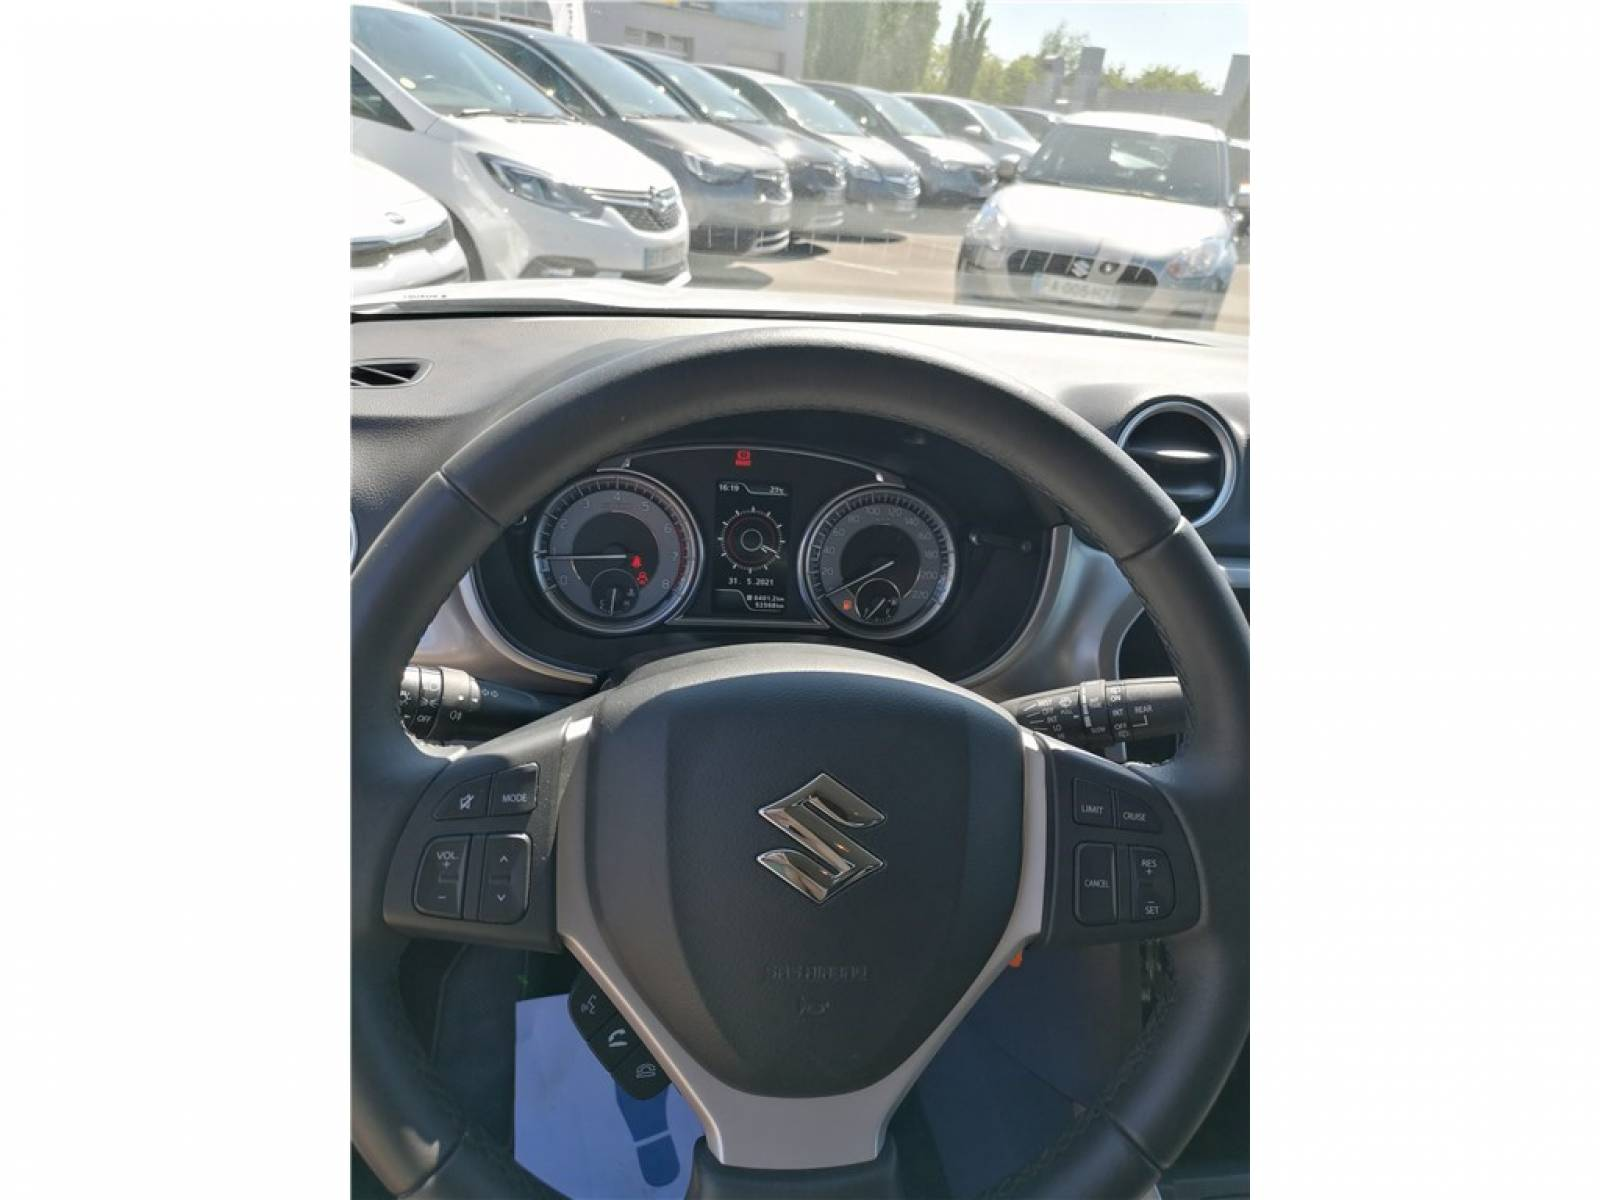 SUZUKI Vitara 1.0 Boosterjet - véhicule d'occasion - Groupe Guillet - Opel Magicauto - Chalon-sur-Saône - 71380 - Saint-Marcel - 21